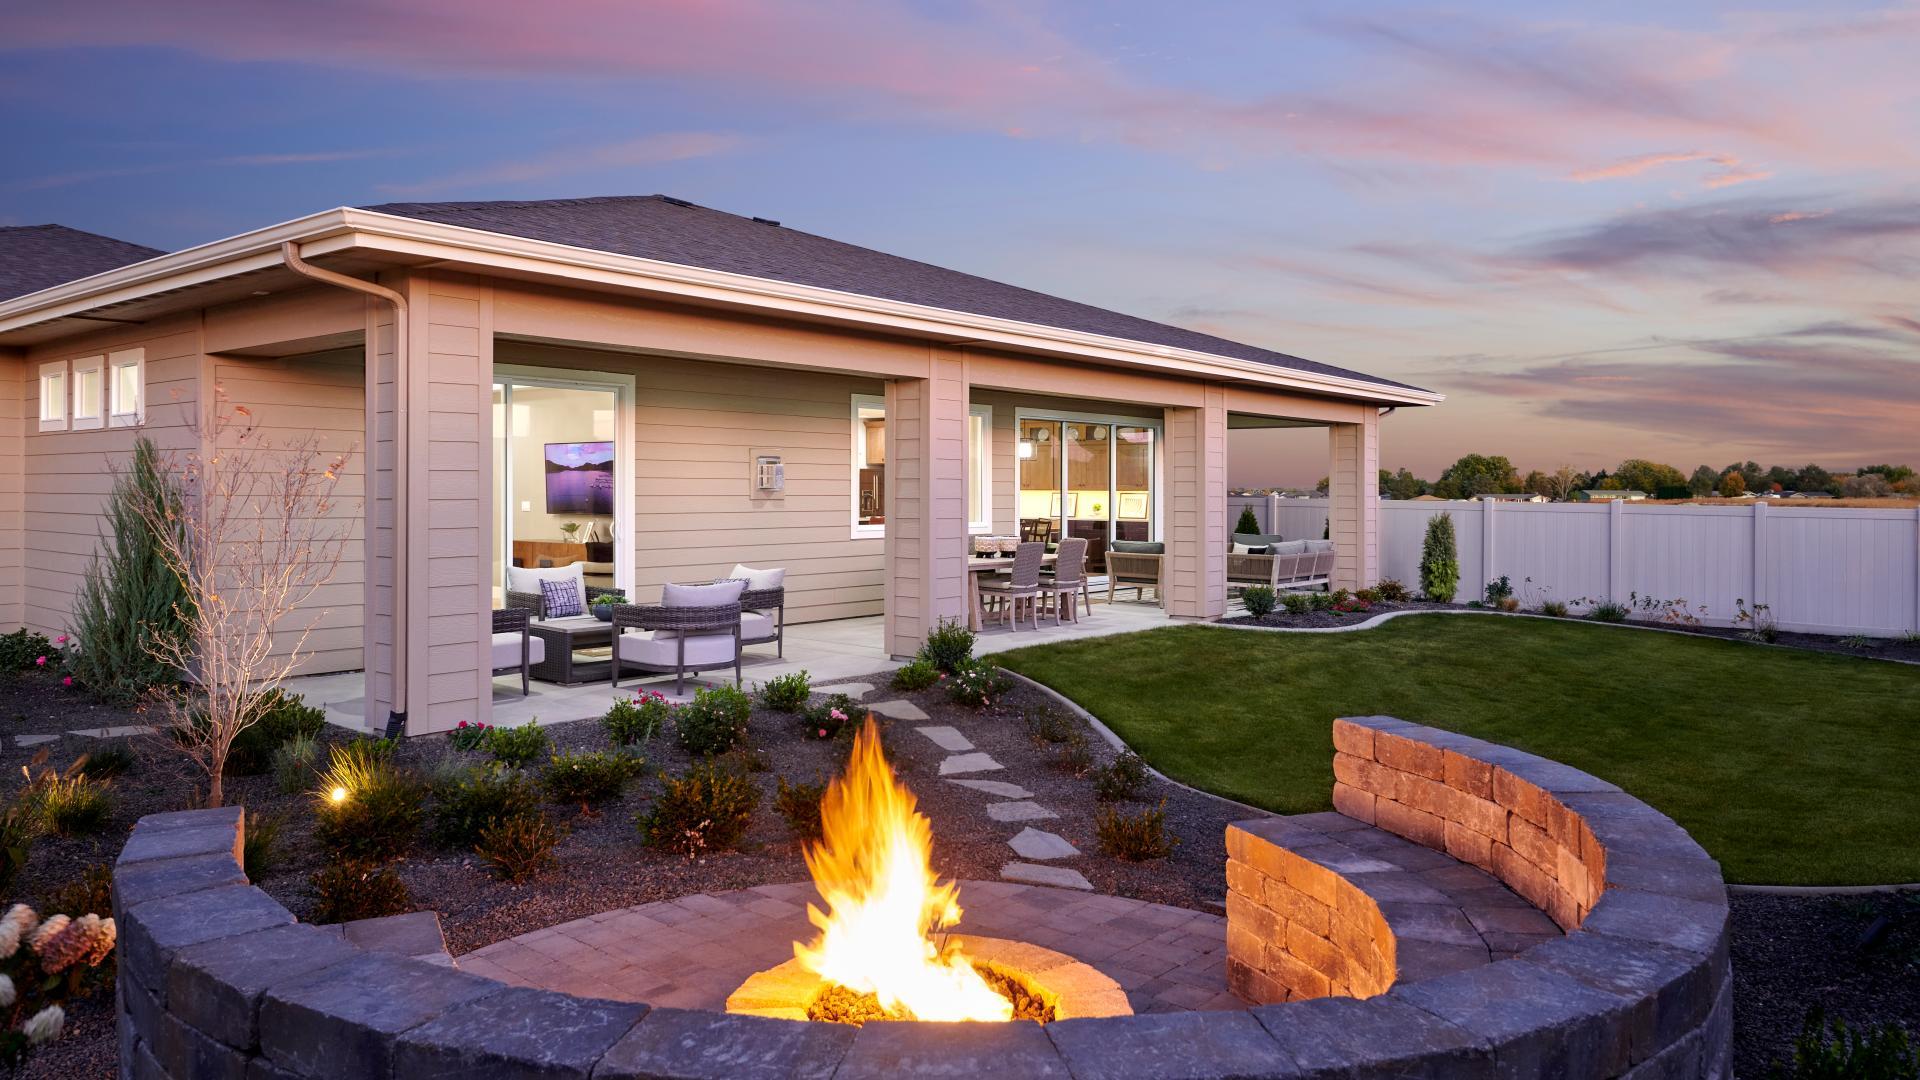 Premium selections make outdoor entertaining easy